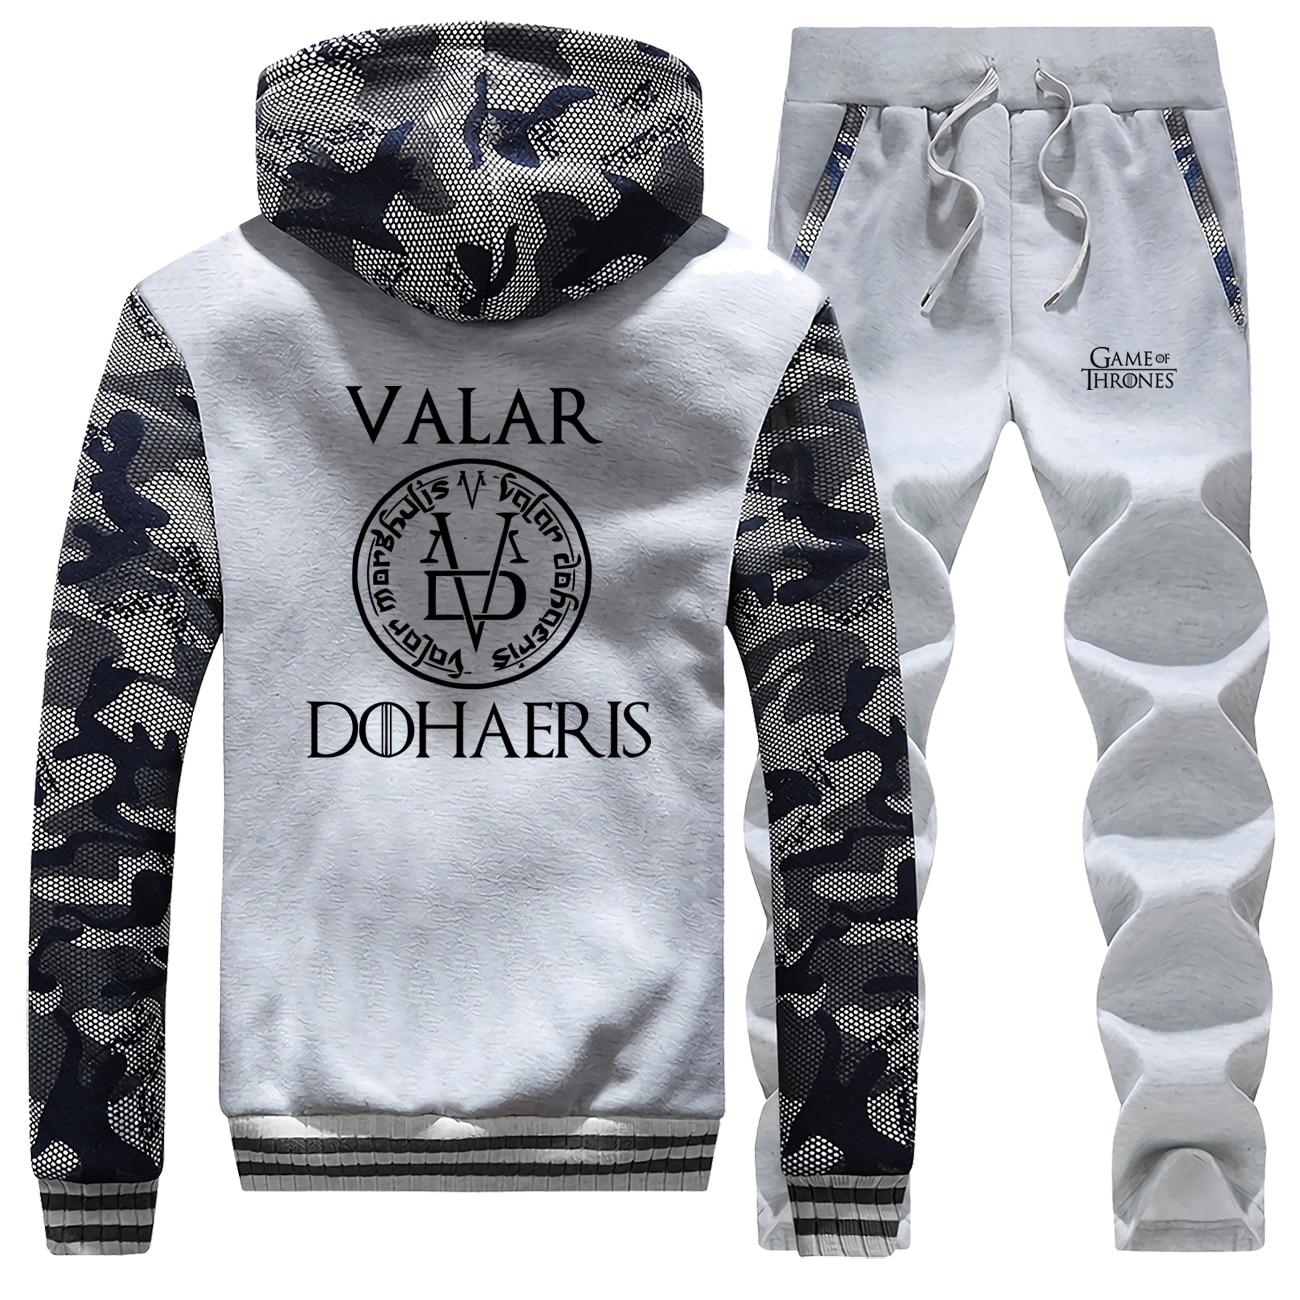 Game Of Thrones Camo Men Set Valar Dohaeris Sportsman Wear Arya Stark Thick Jacket 2019 Winter Hoodie Warm Fashion Two Piece Set